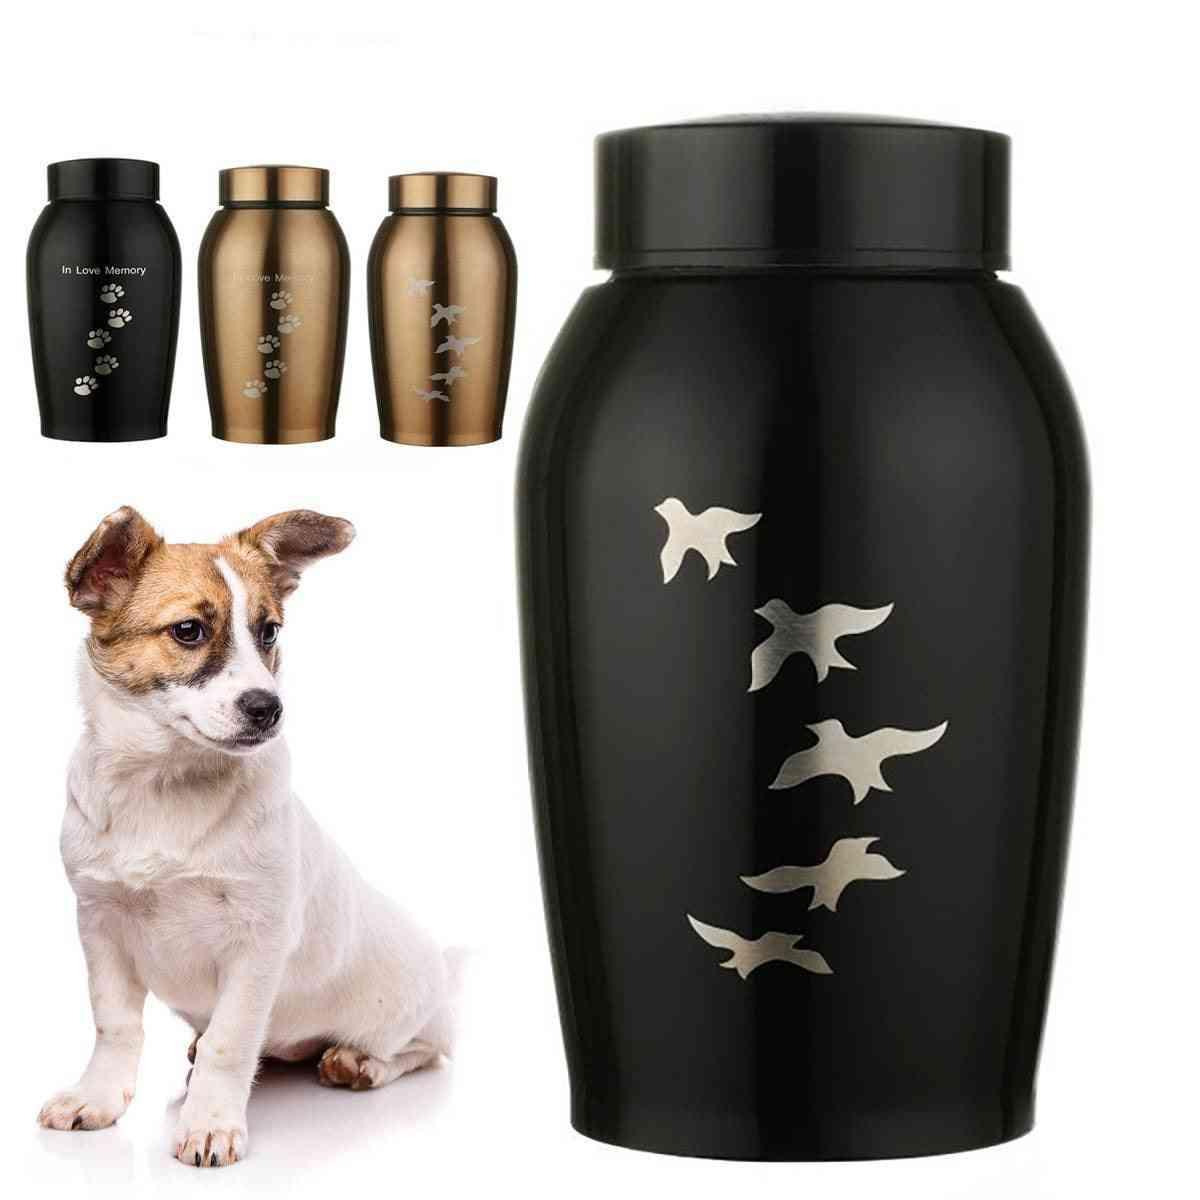 Stainless Steel Pets Dog, Cat, Birds, Mouse Cremation Ashes Urn Keepsake Casket Columbarium Pets Memorials